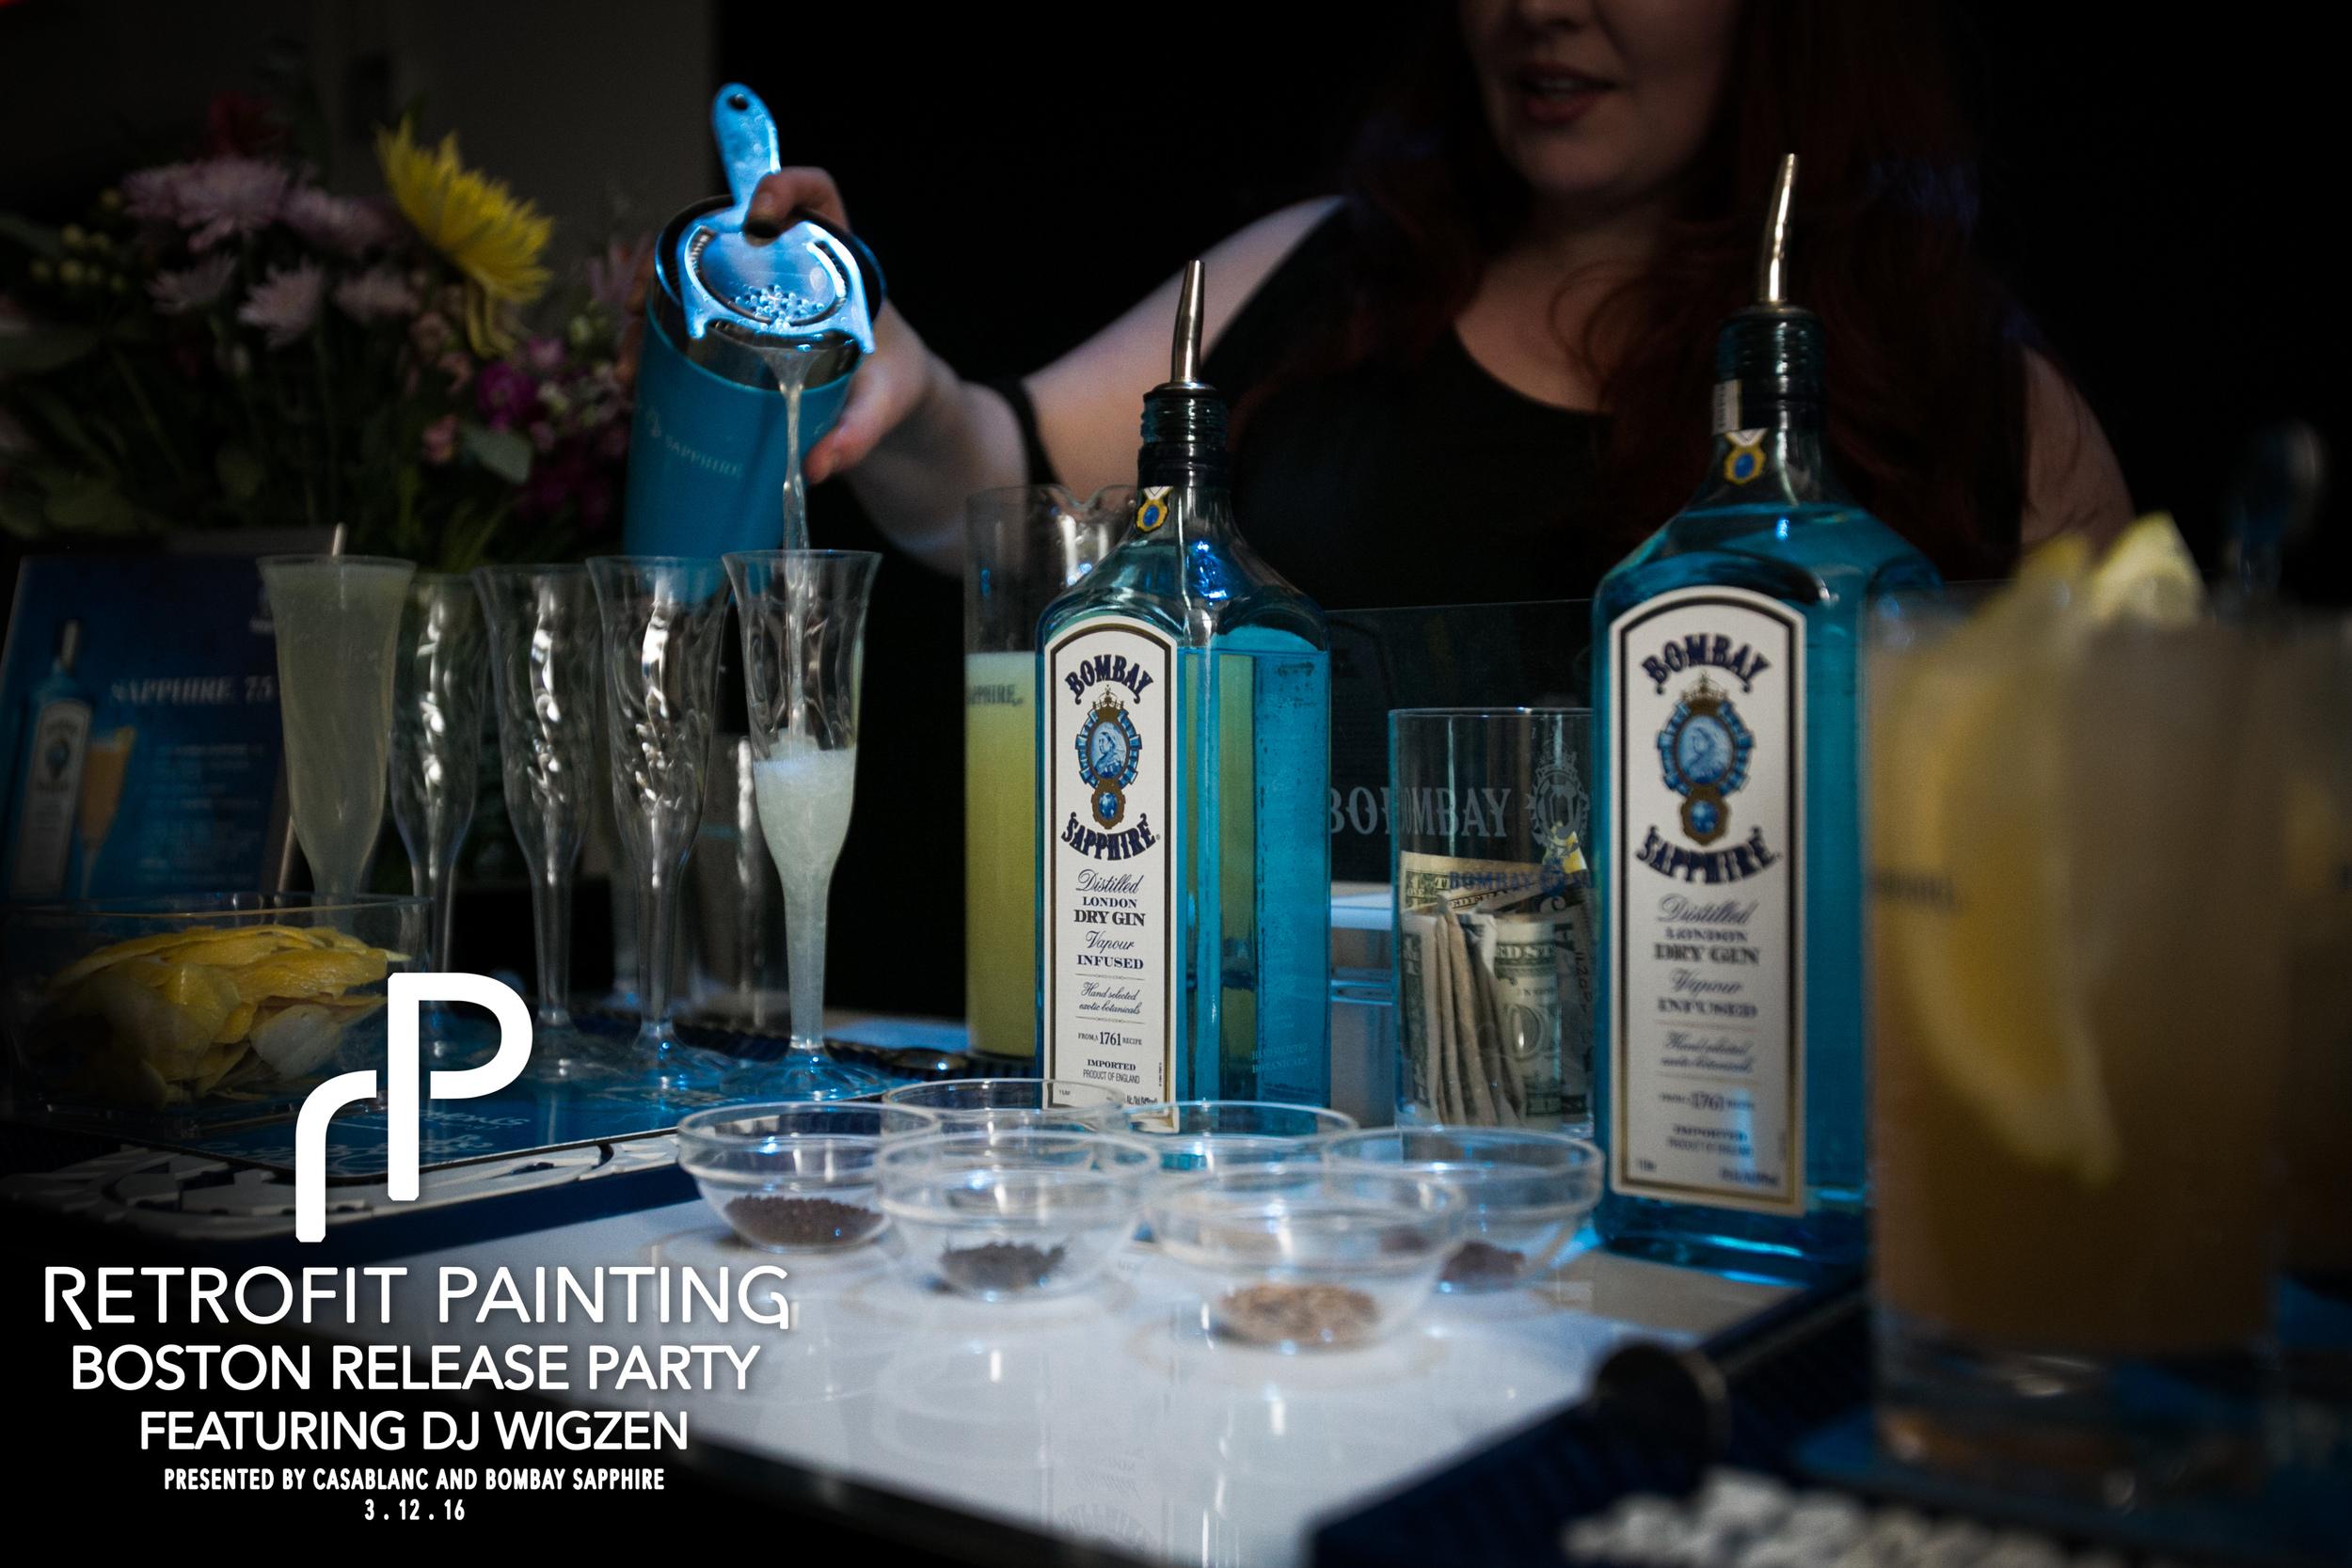 Retrofit Painting Boston Release Party 0168.jpg